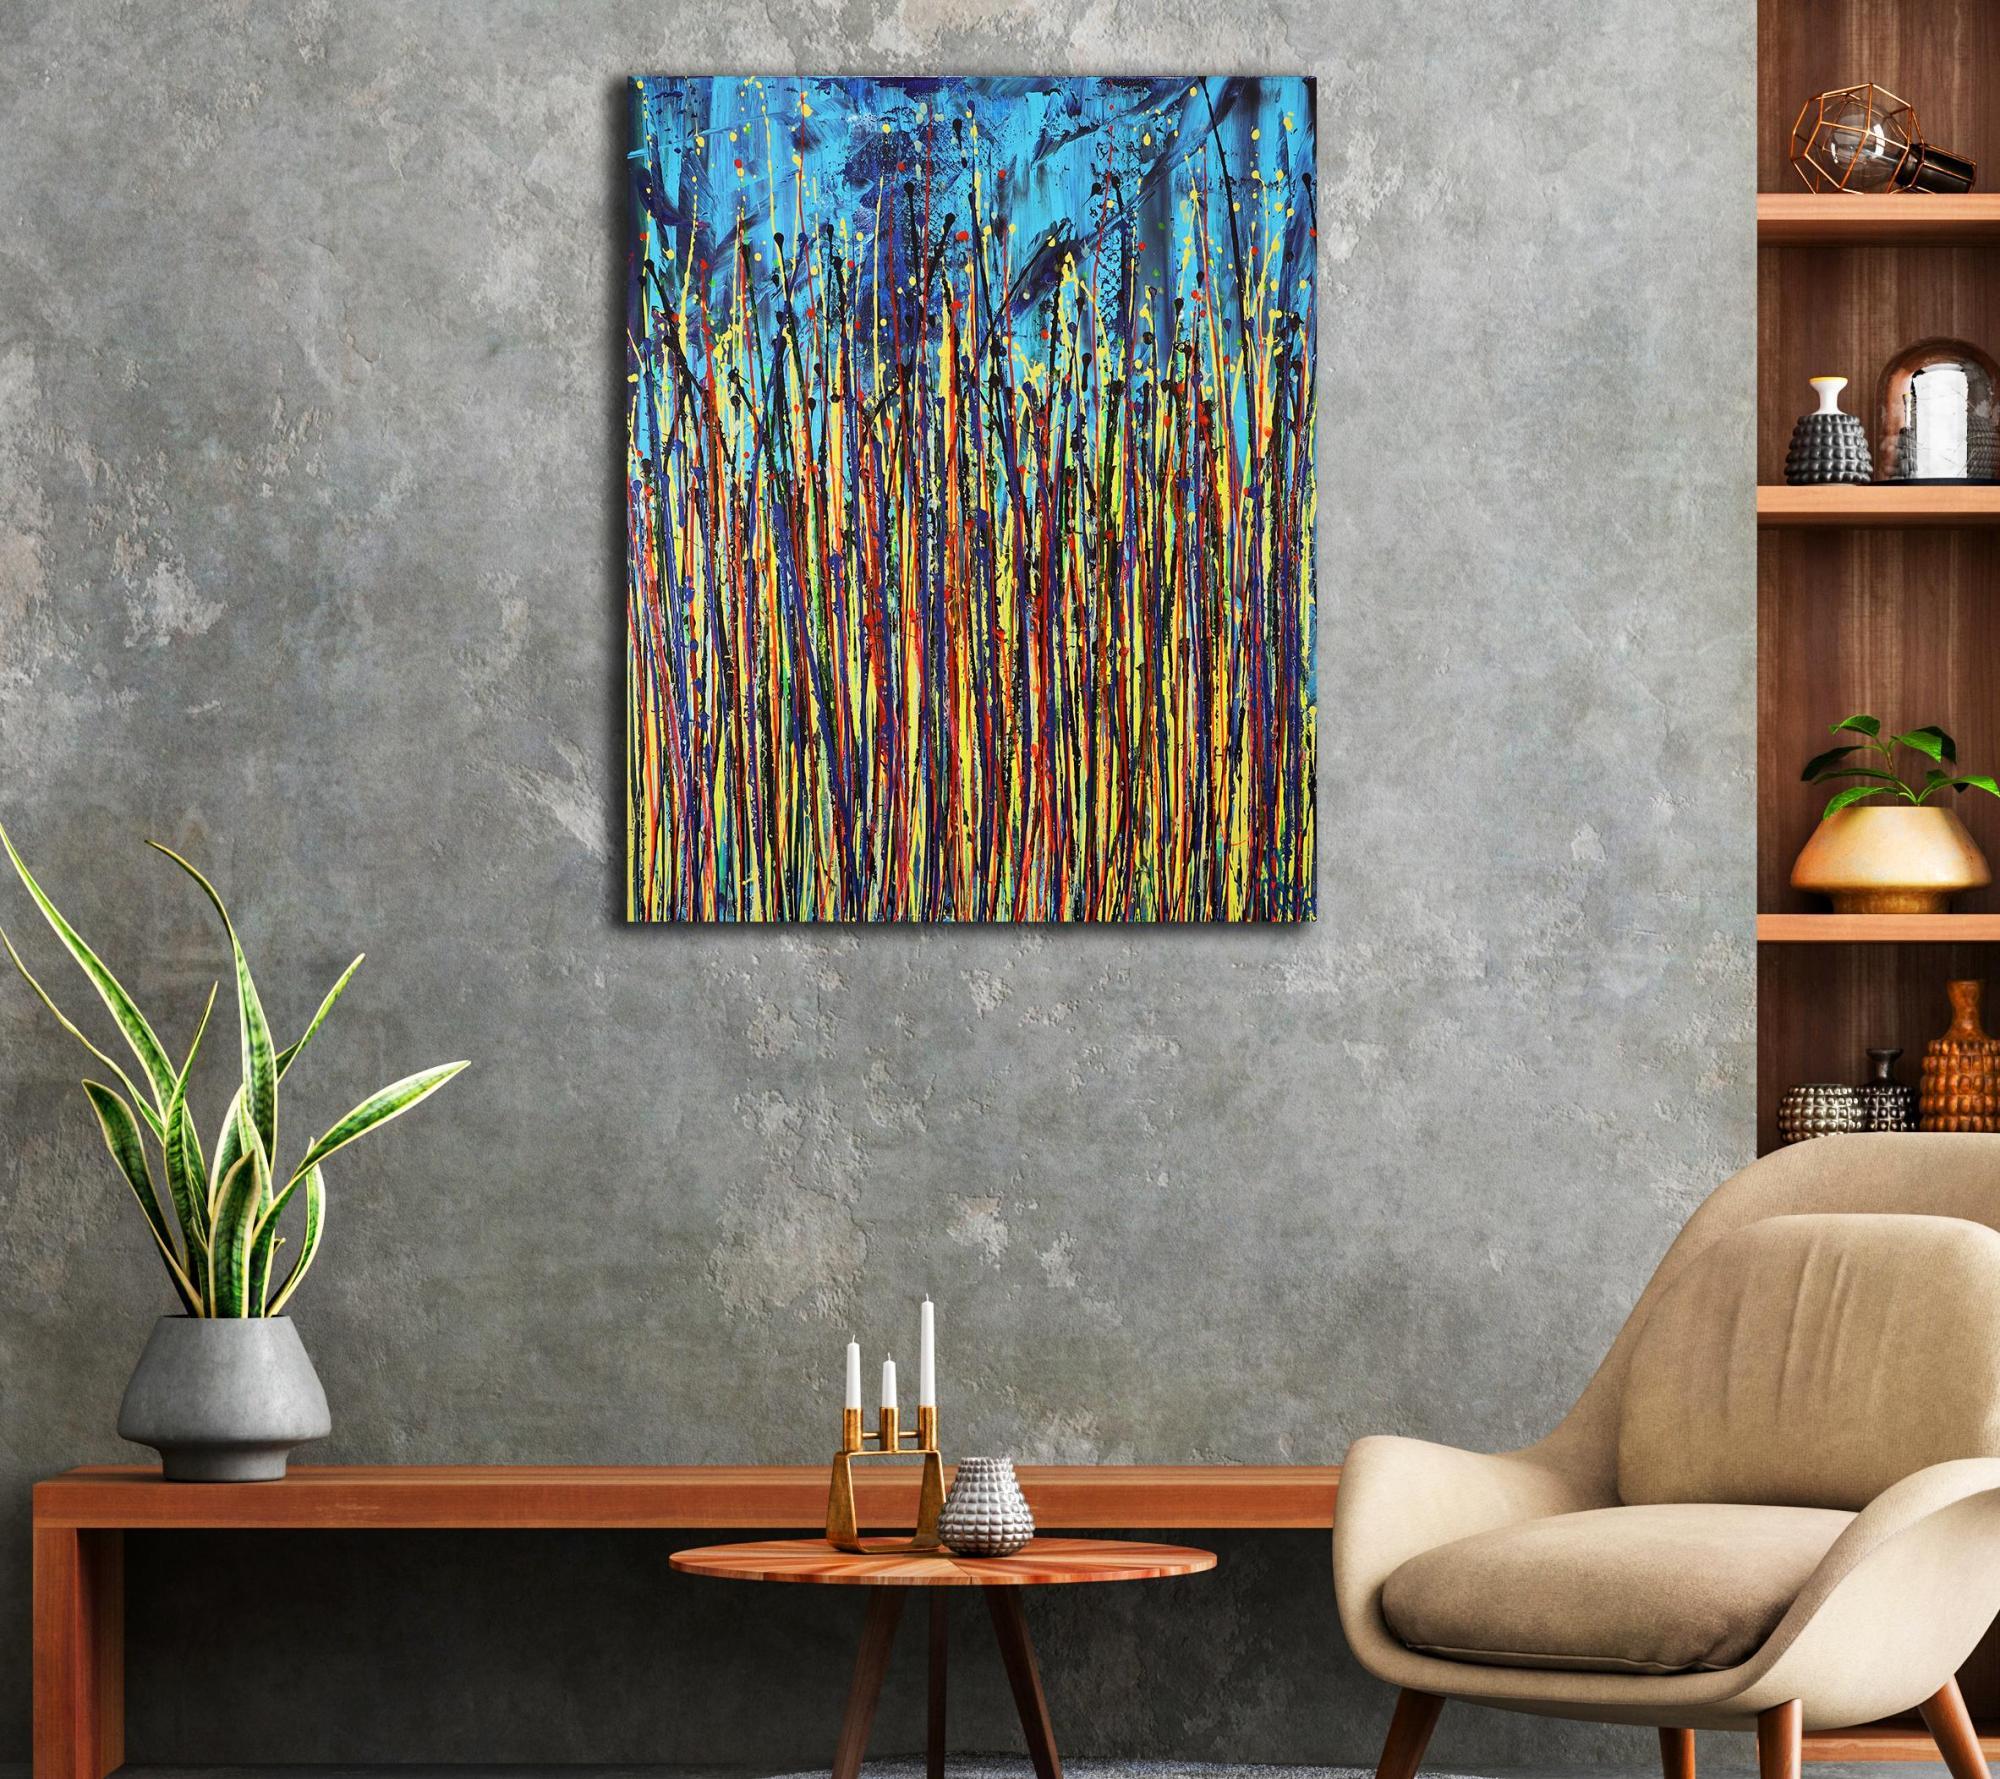 Faces of Nature 1 (2021) / Room example / Artist: Nestor Toro